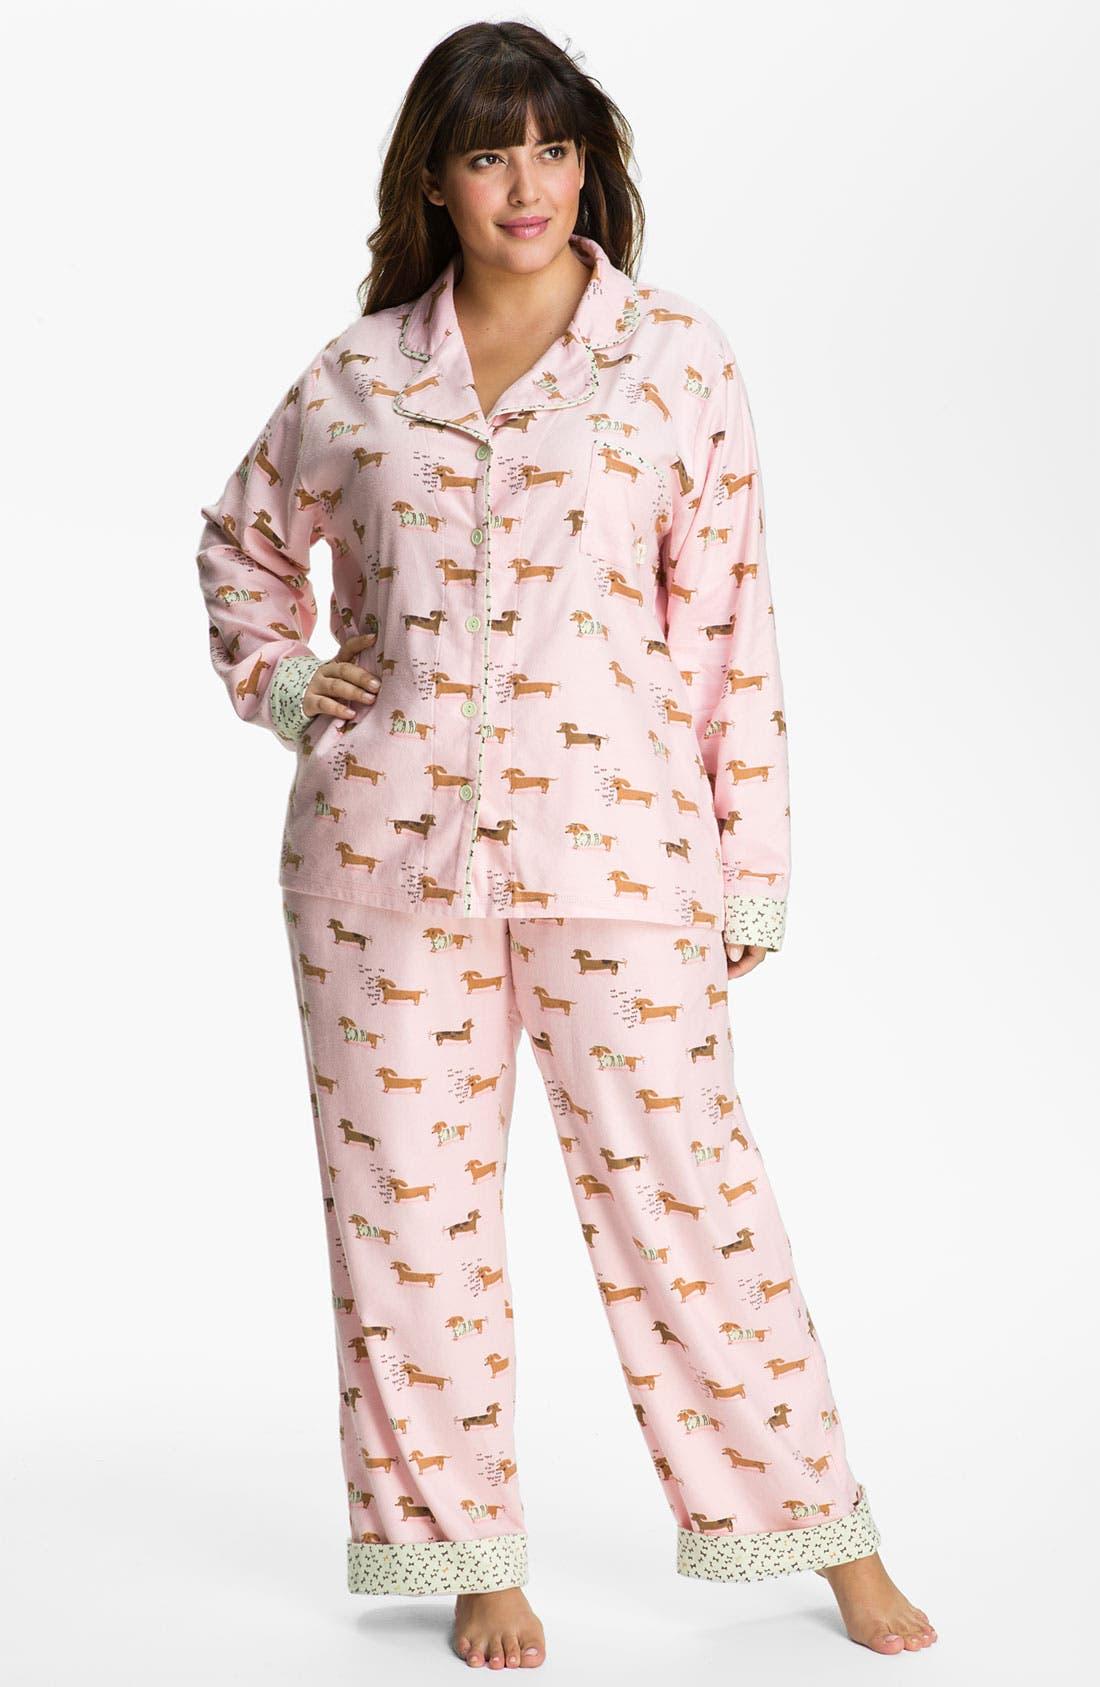 Main Image - Munki Munki Print Flannel Pajamas (Plus Size)